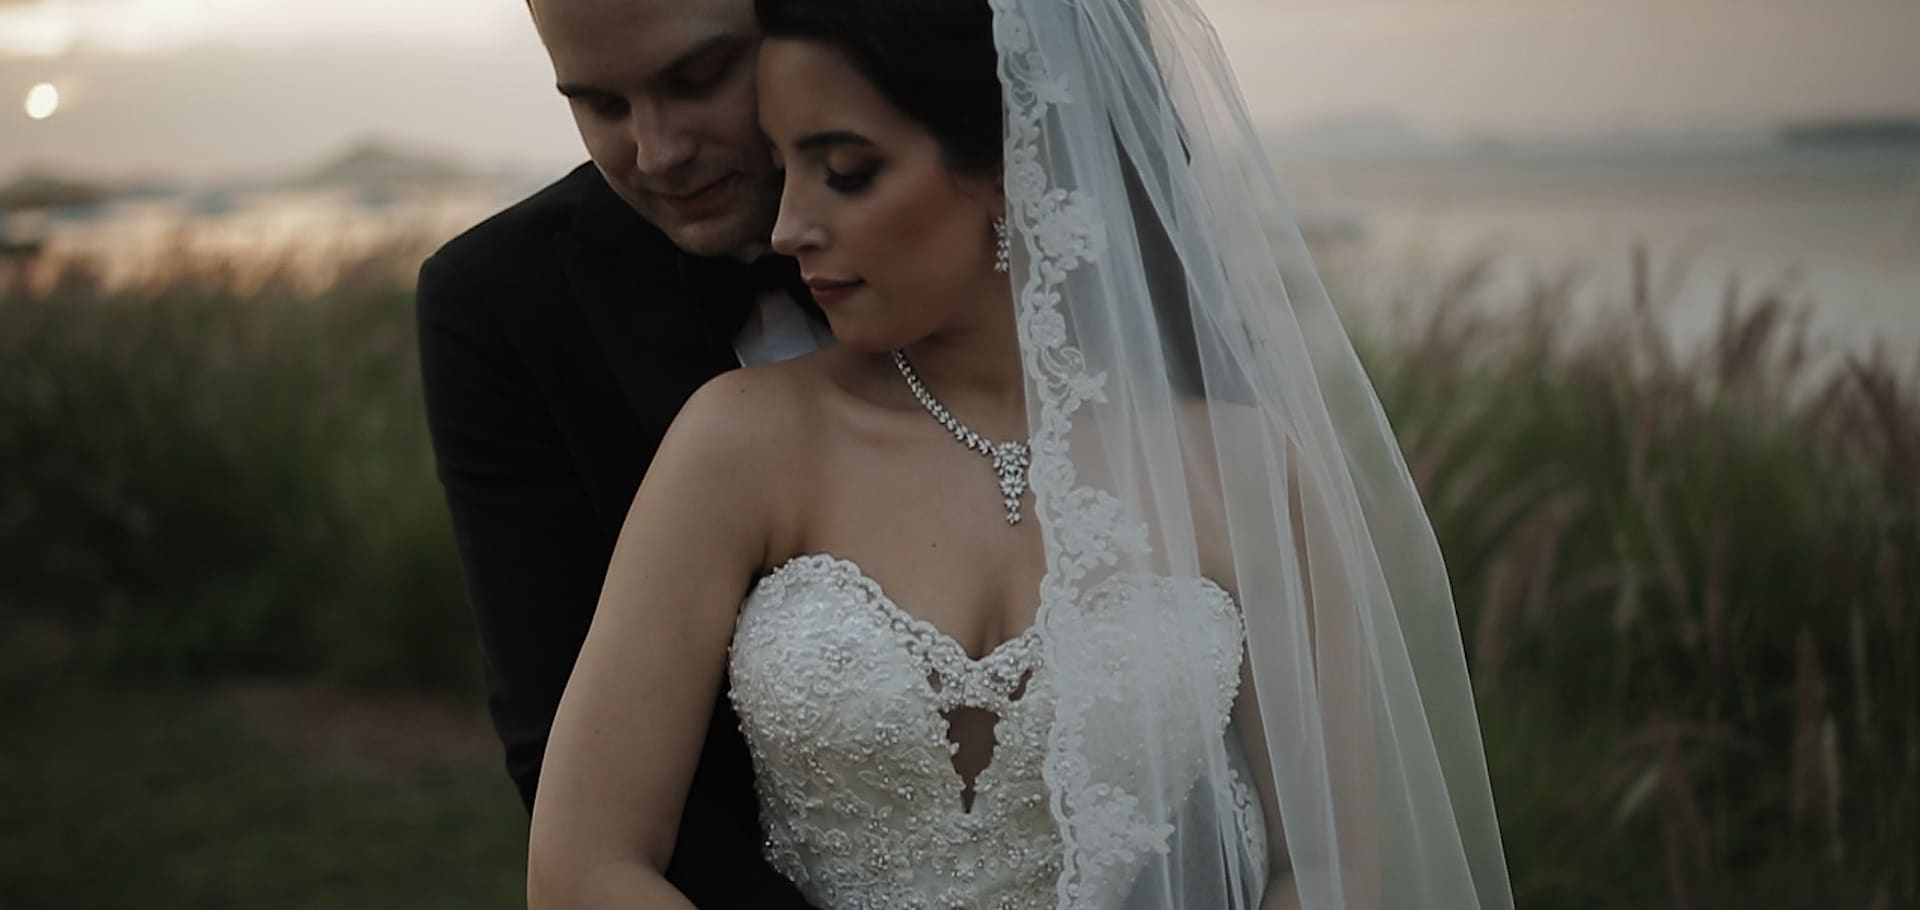 Four Seasons Resort Dubai Wedding Videography - Morning Jacket Films